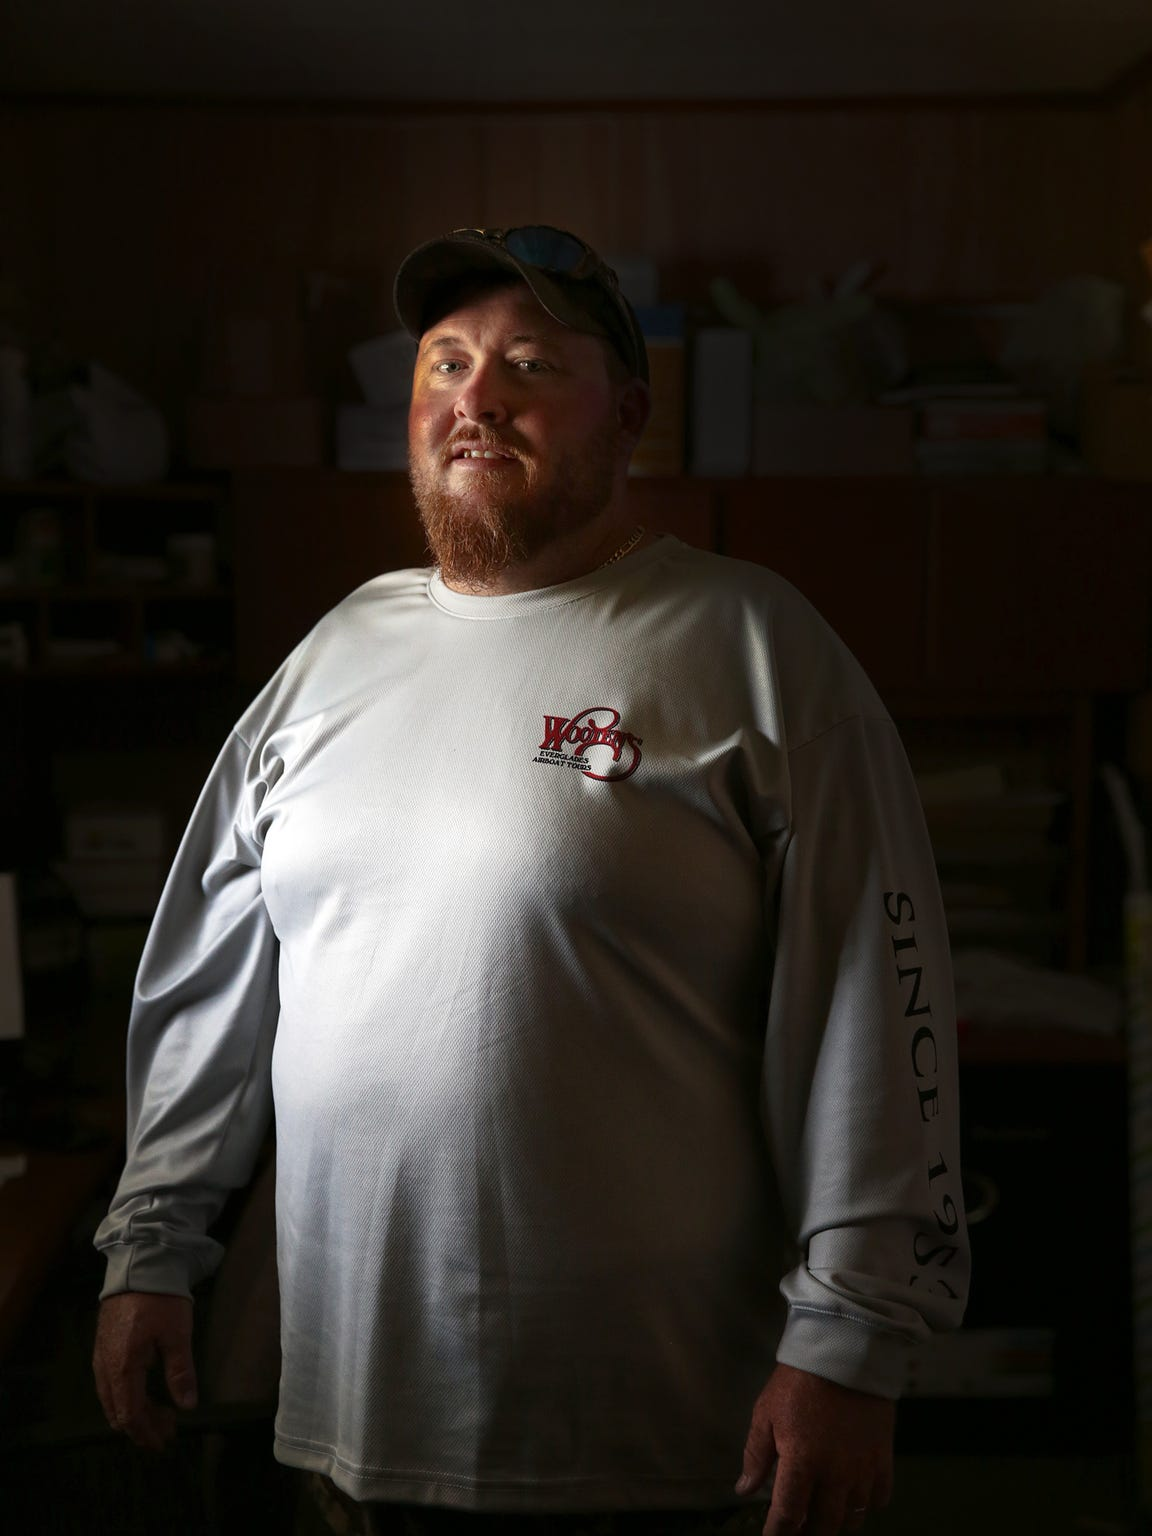 Carl Nicholson manages Wooten's Everglades Airboat